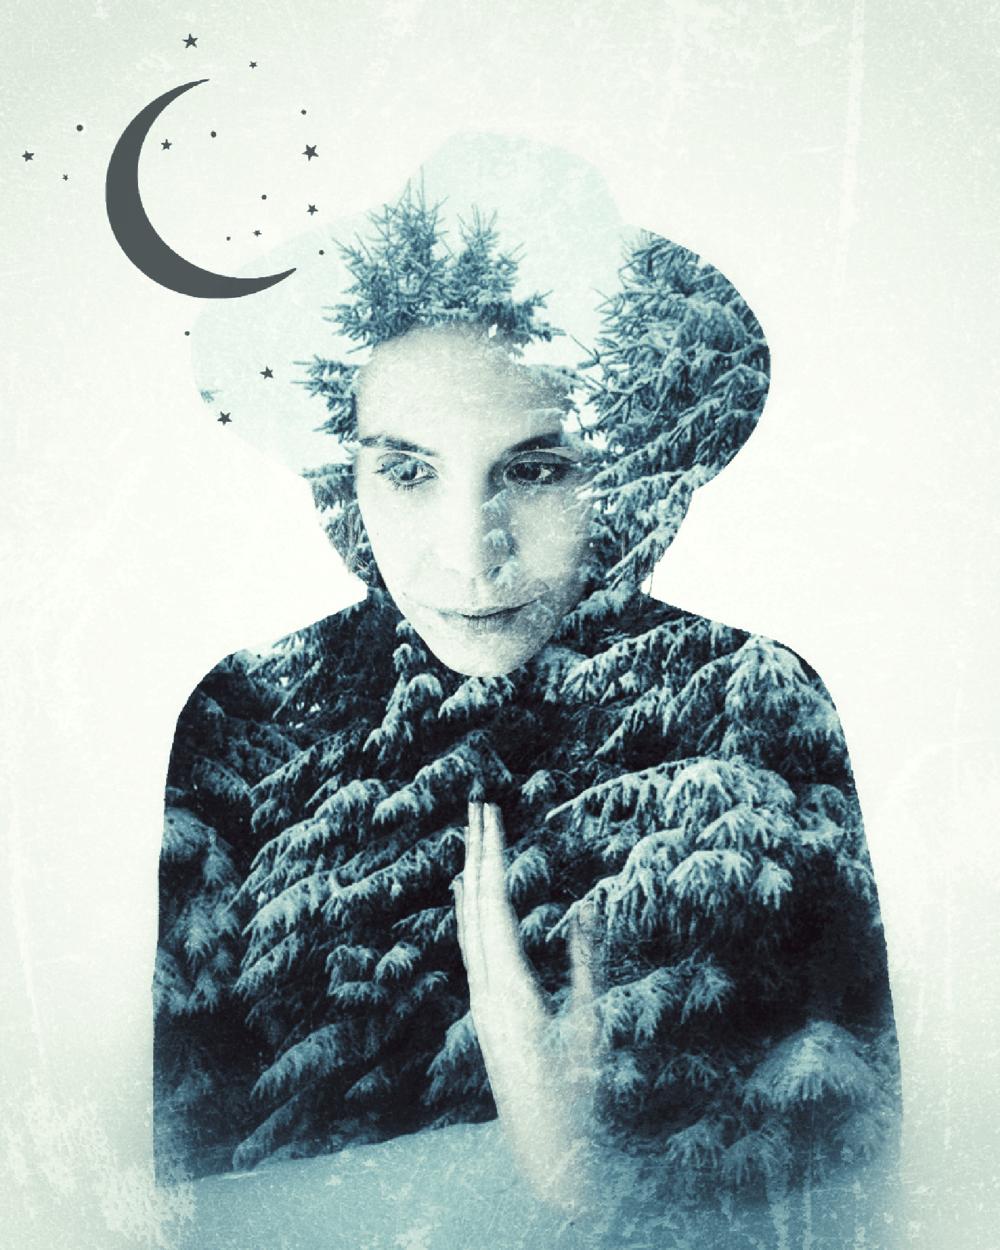 Composite Portrait Examples :) - image 6 - student project